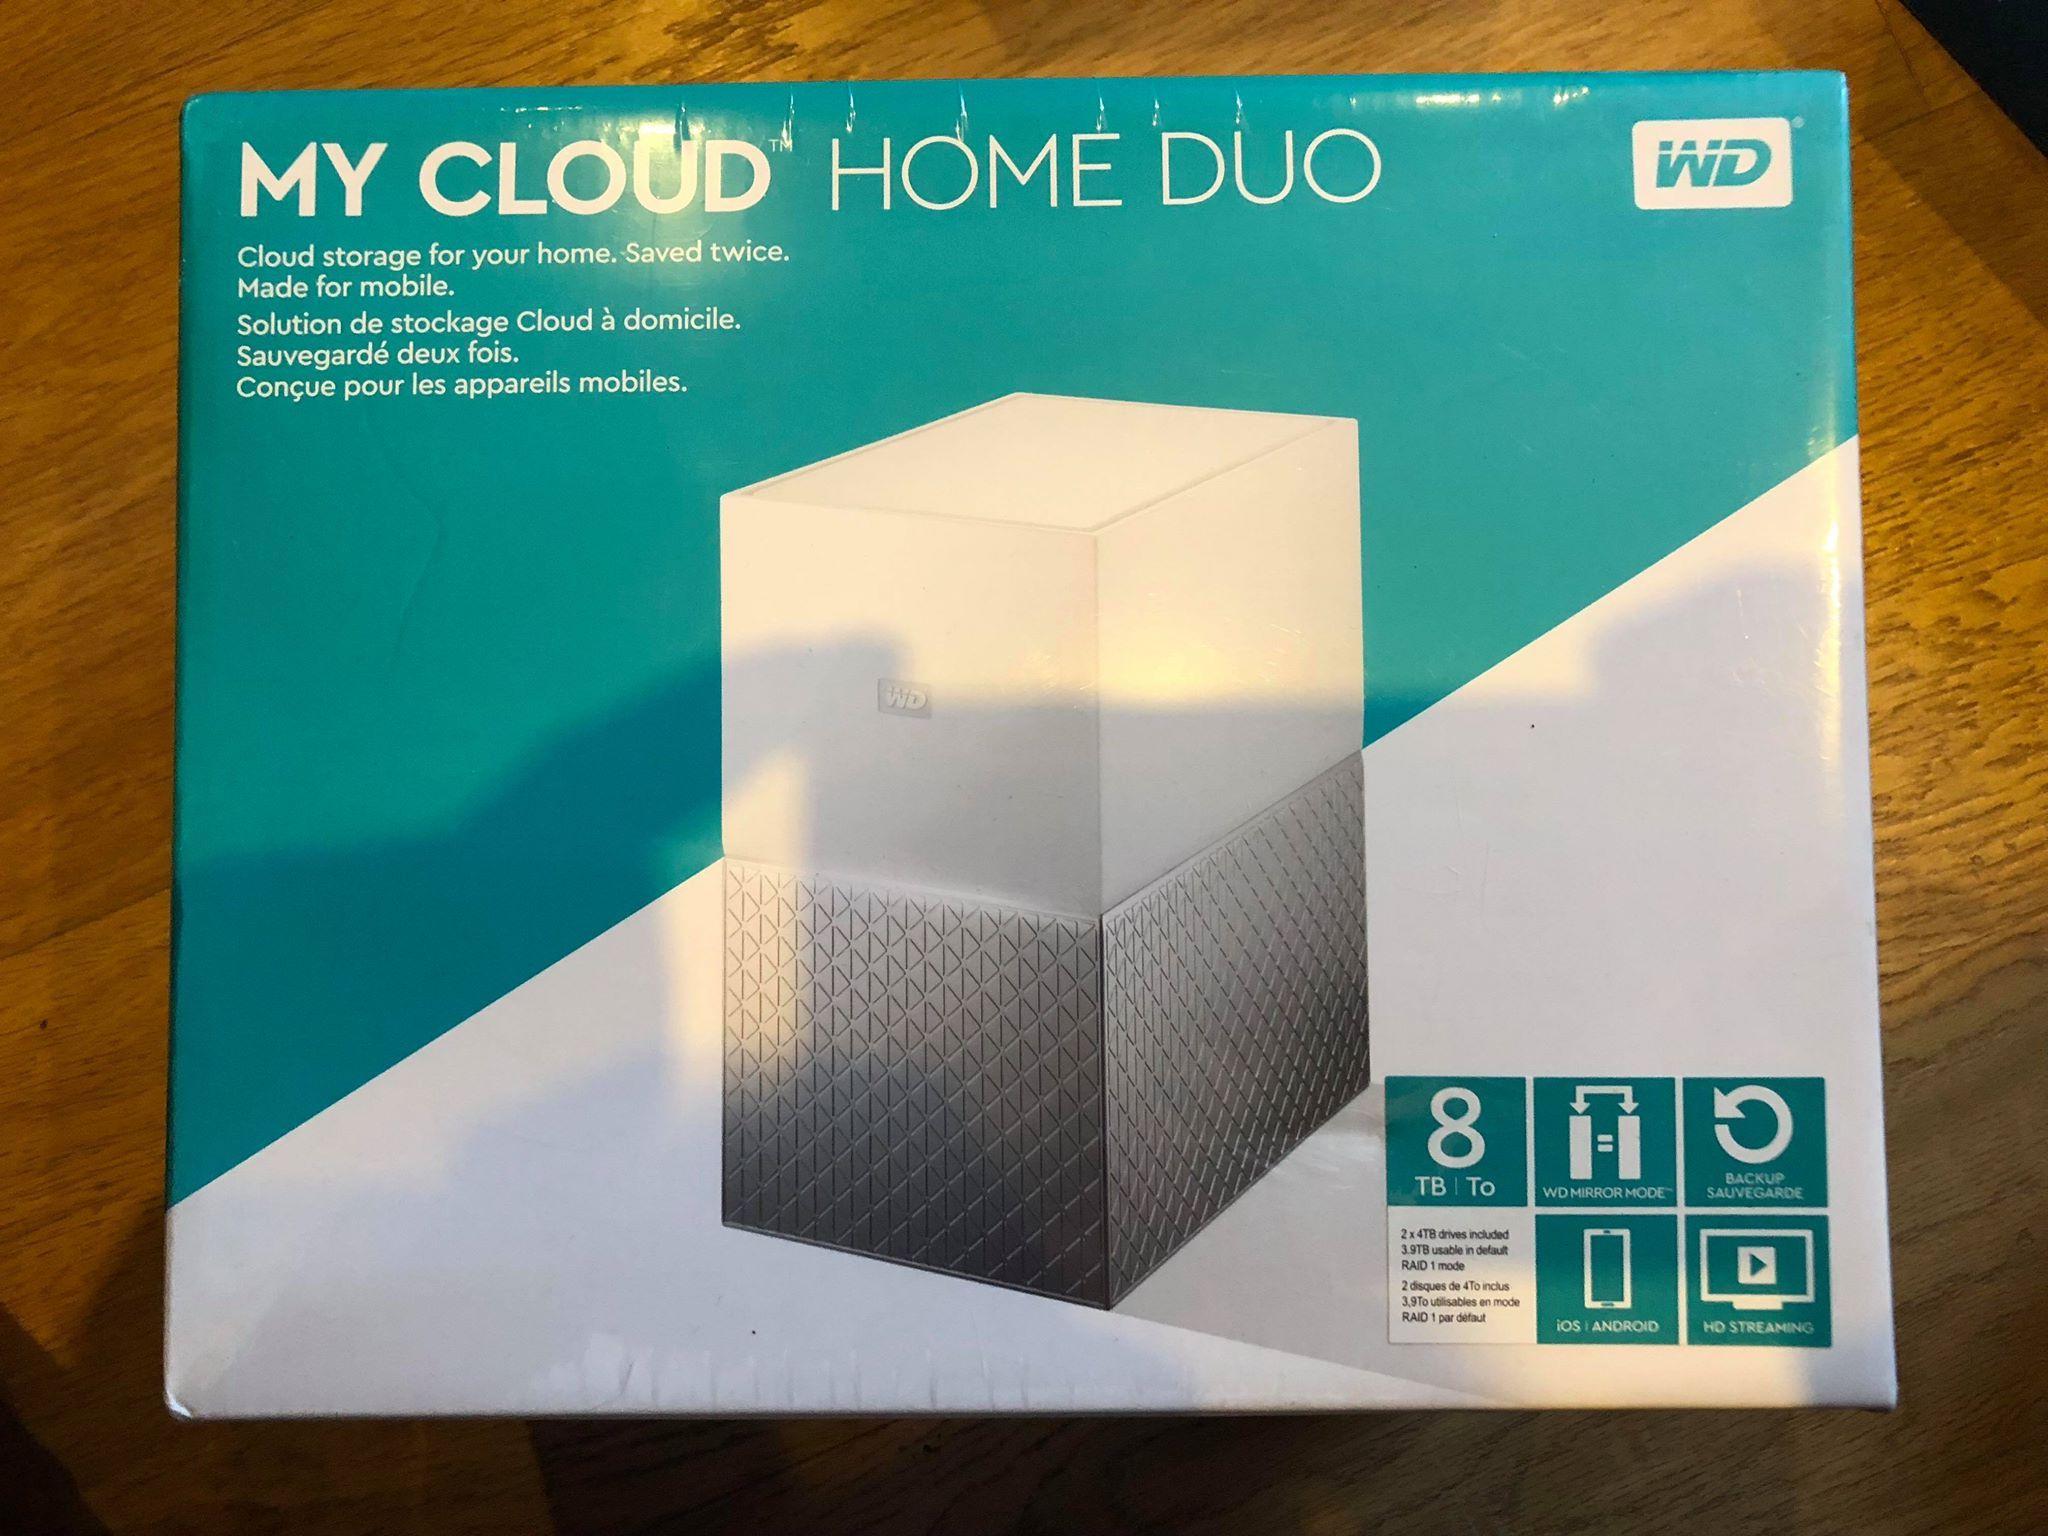 Jual Wd My Cloud Nas 8 Tb Terbaru 2018 Aigner A24206e Original Western Digital Home Duo 8tb Gw 7258036699